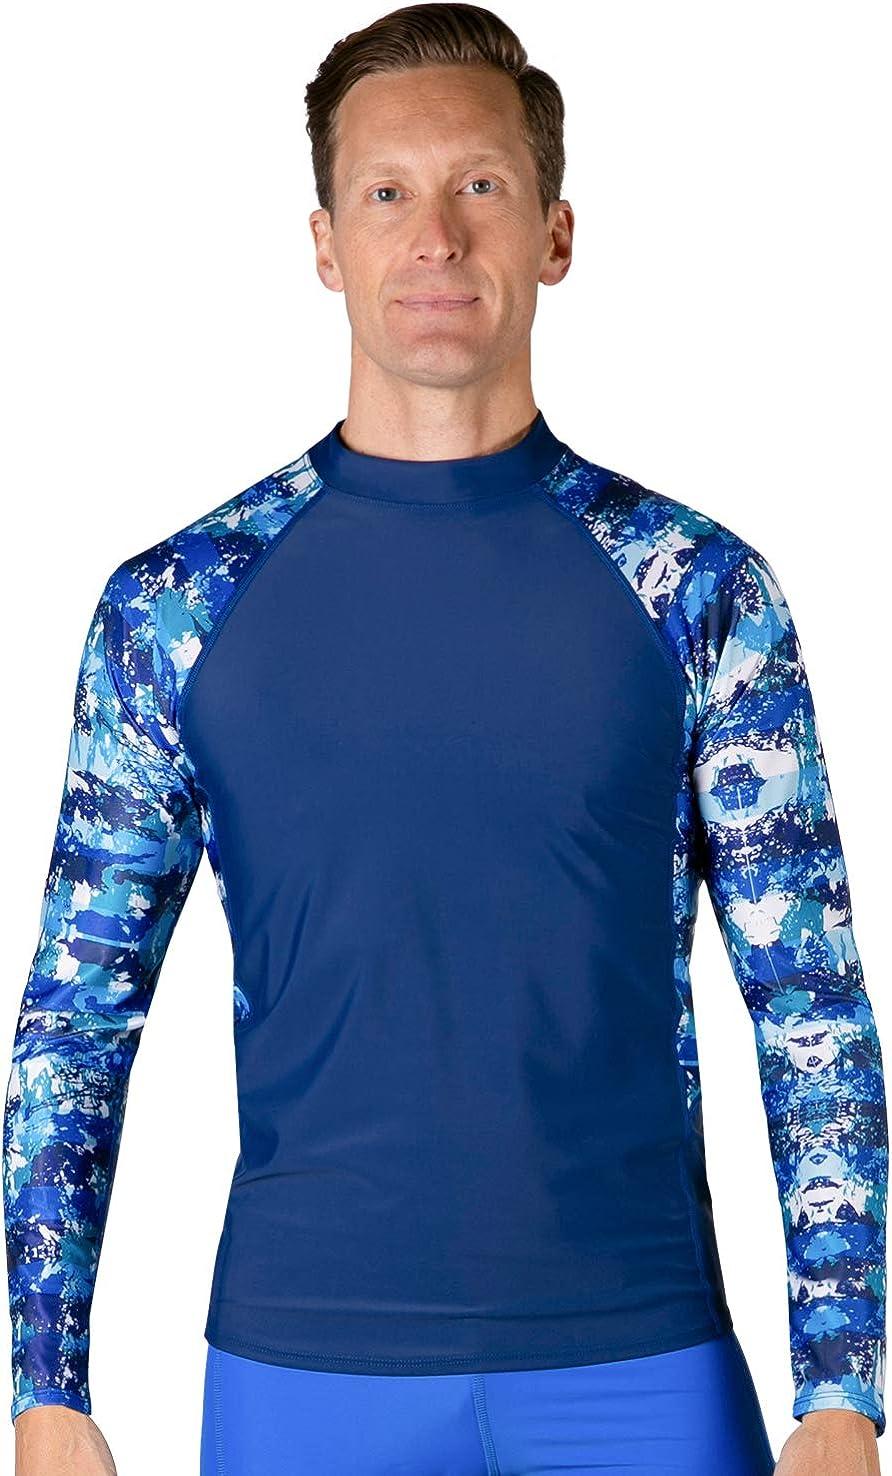 Tuga Men's Swim Performance Rash Guard, UPF 50+ Sun Protection